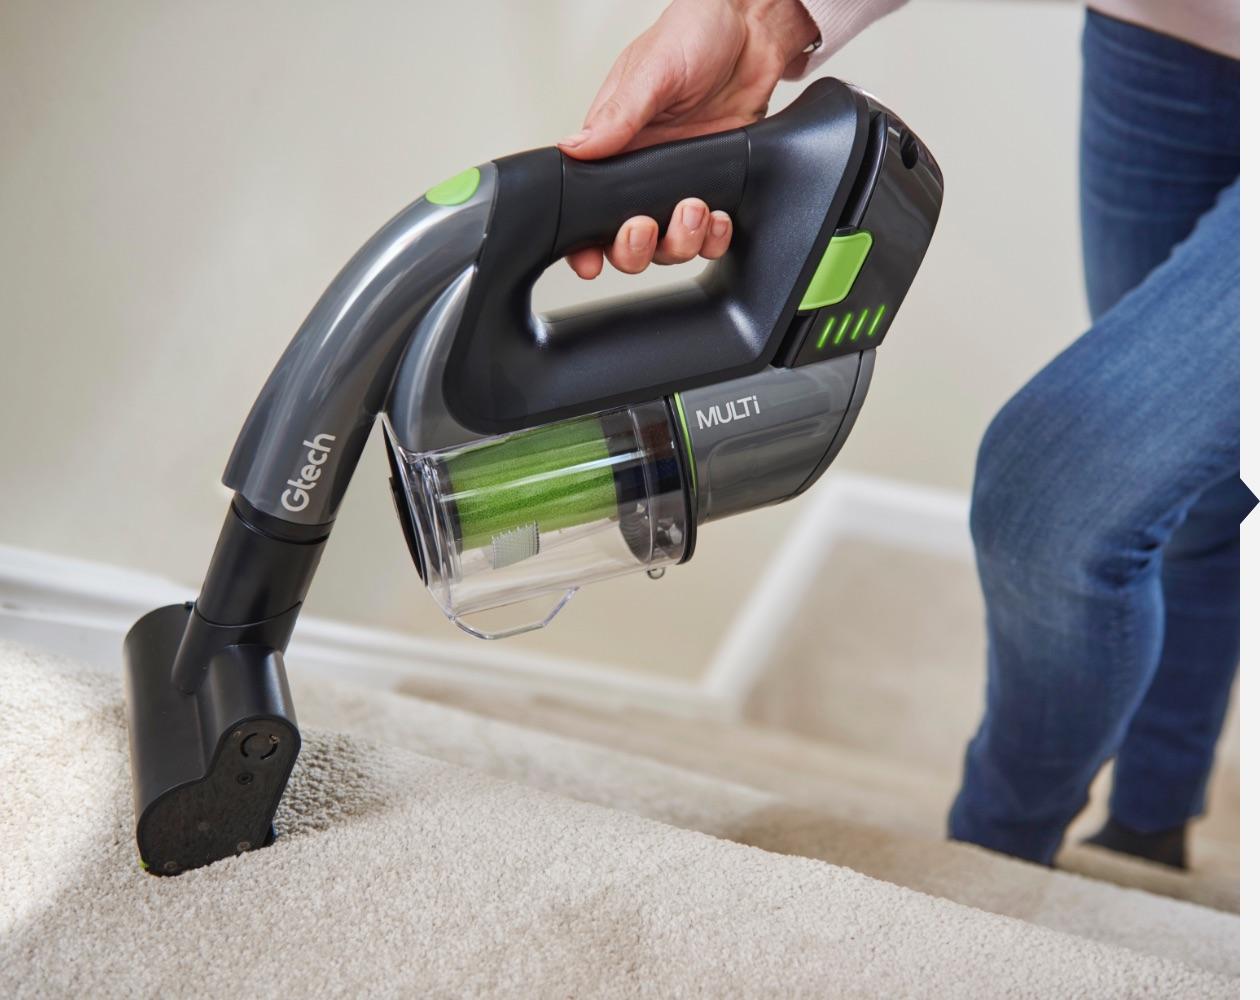 Multi handheld vacuum cleaner used on stairs